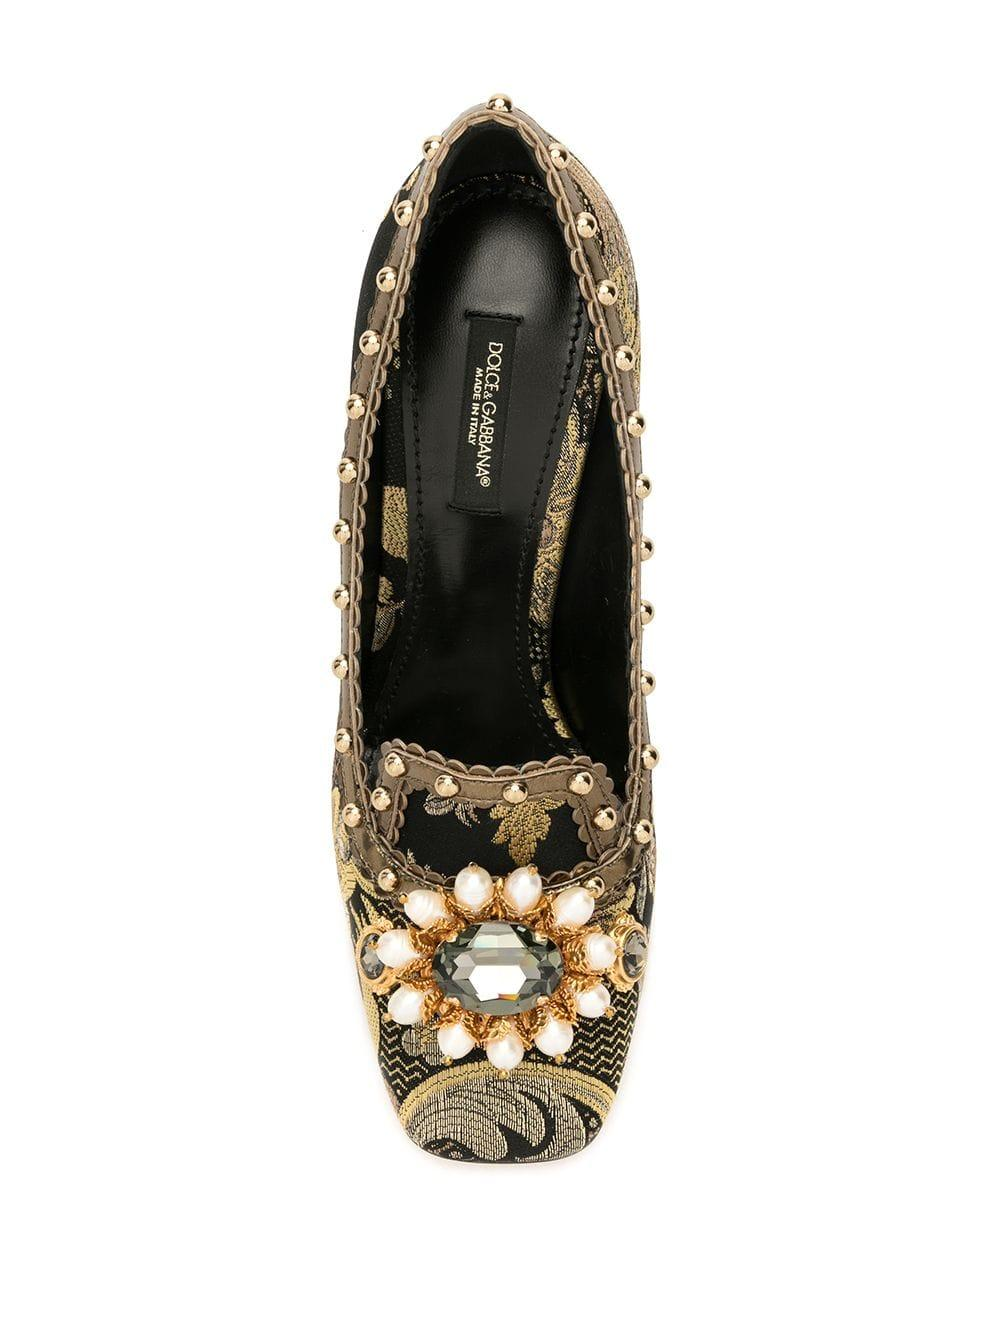 Zapatos de tacón con efecto en jacquard Dolce & Gabbana de Cuero de color Negro